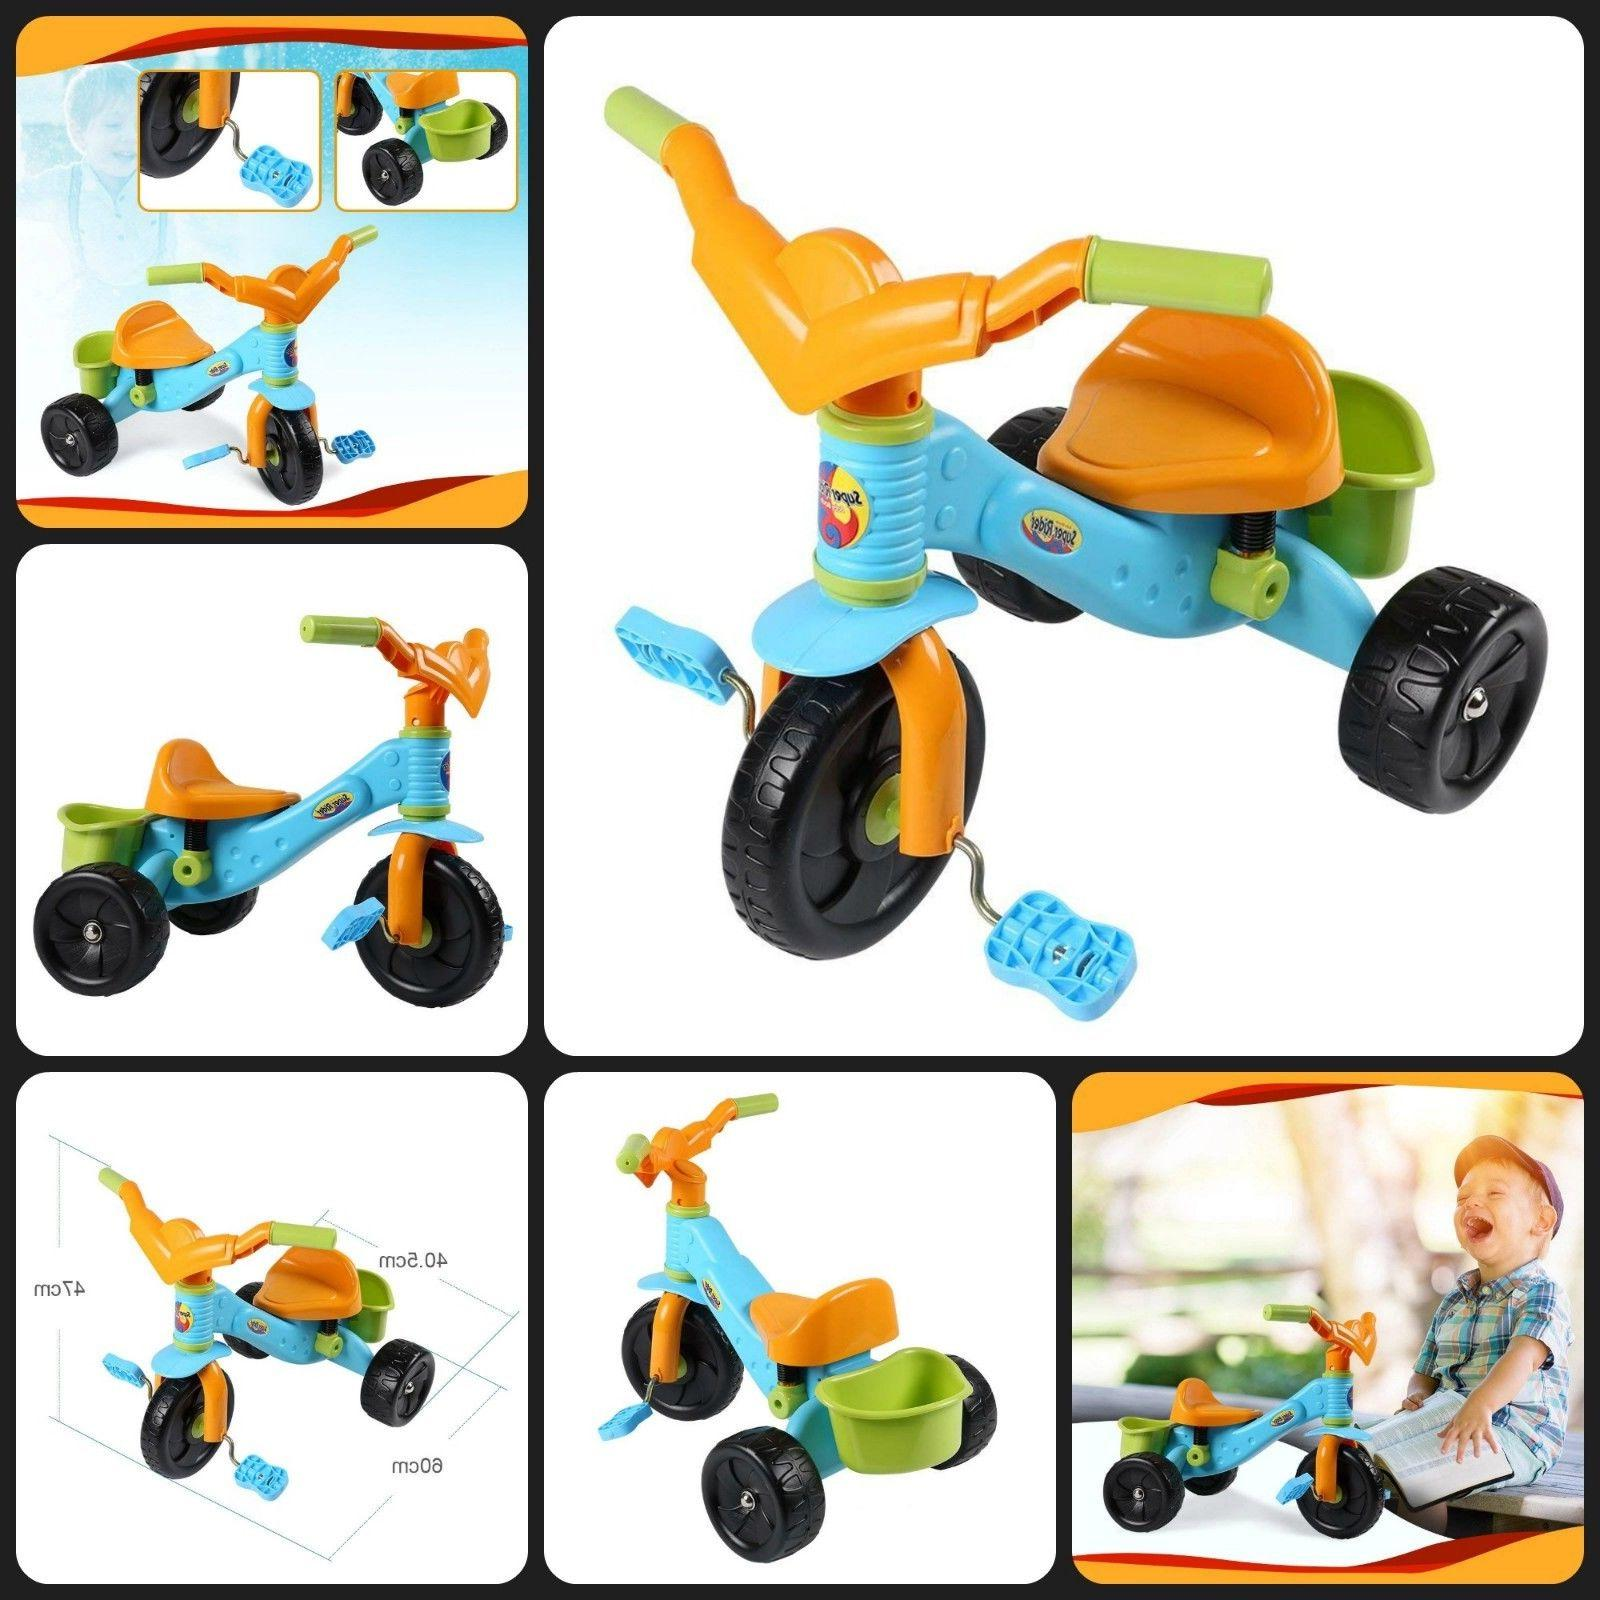 Virhuck Kids First Trikes for Children 3 Pedal Bike for 2 Old Multi-Coloured, Maximum KG